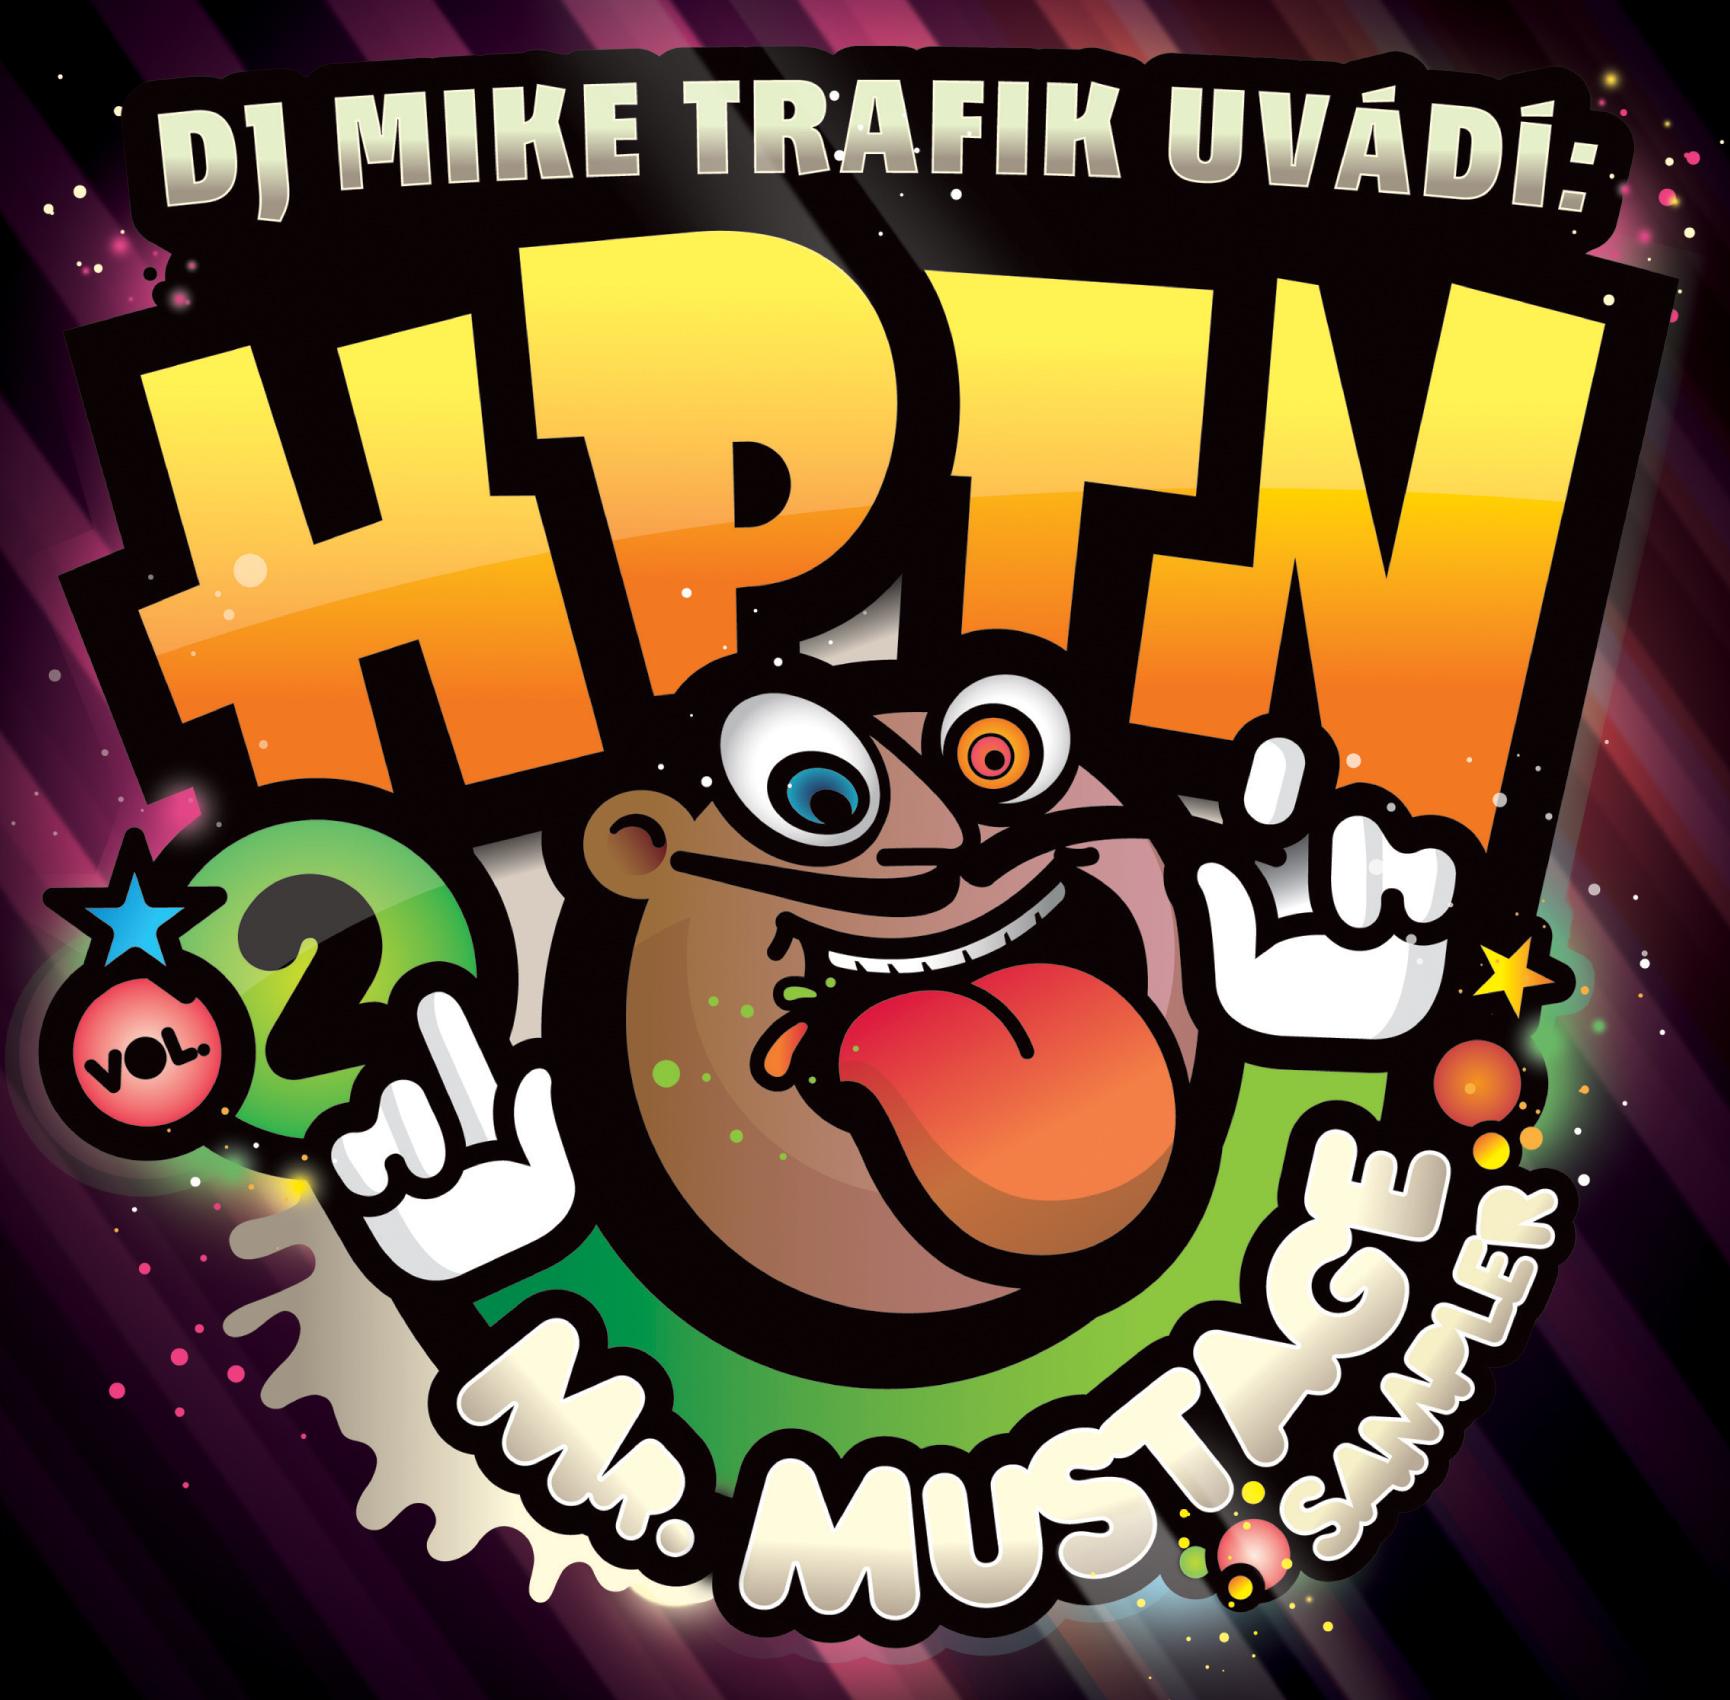 DJ Mike Trafik uvádí H.P.T.N. 2